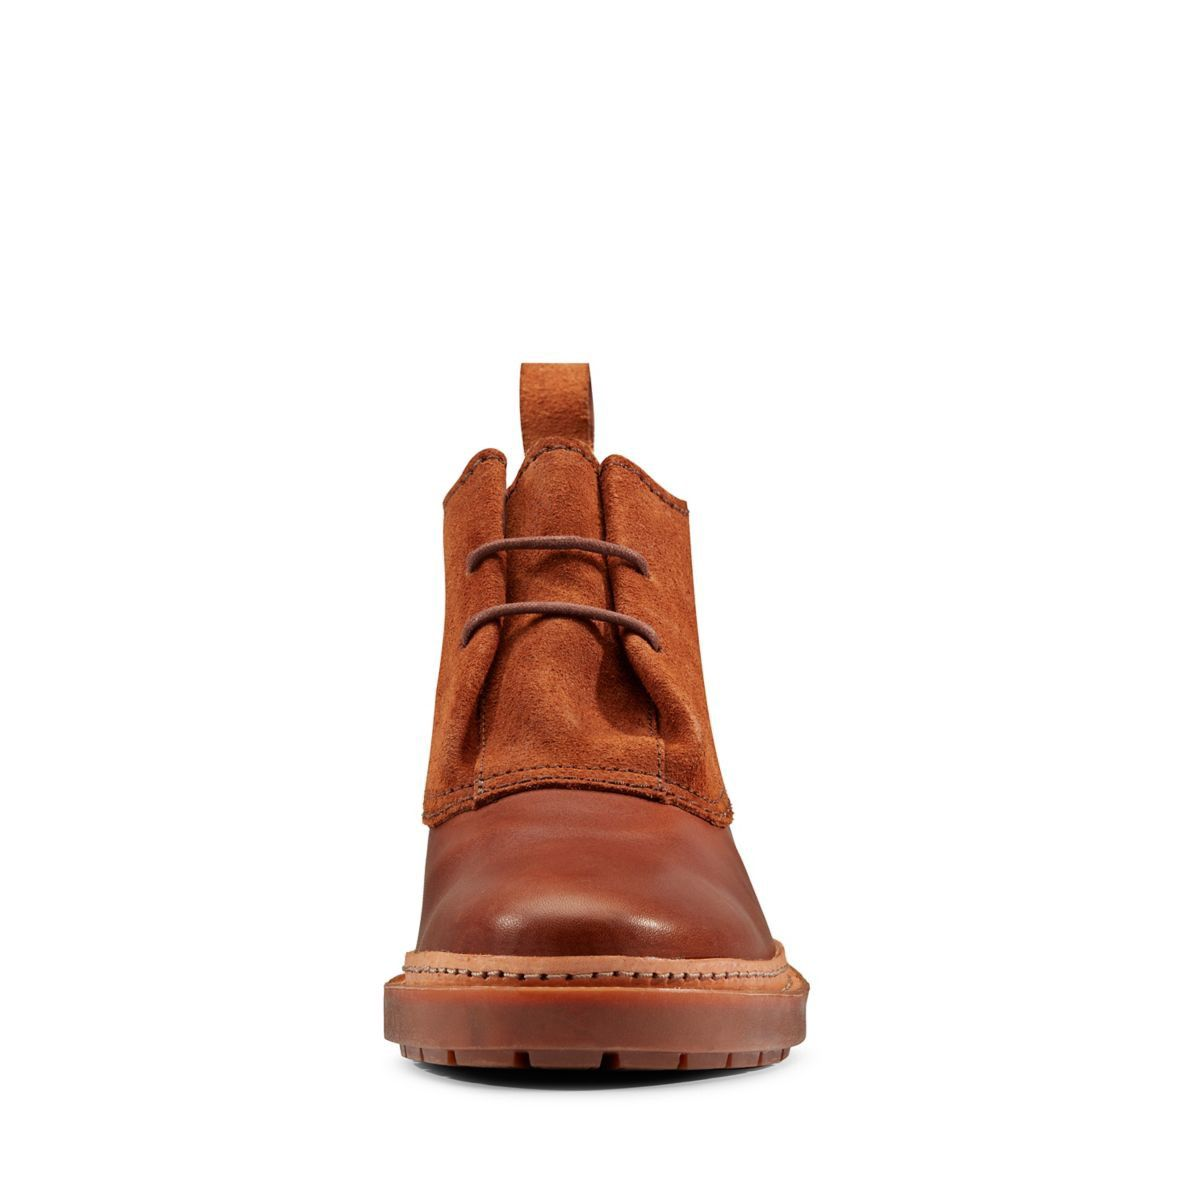 Clarks Trace Fawn - Womens Boots Dark Tan 6